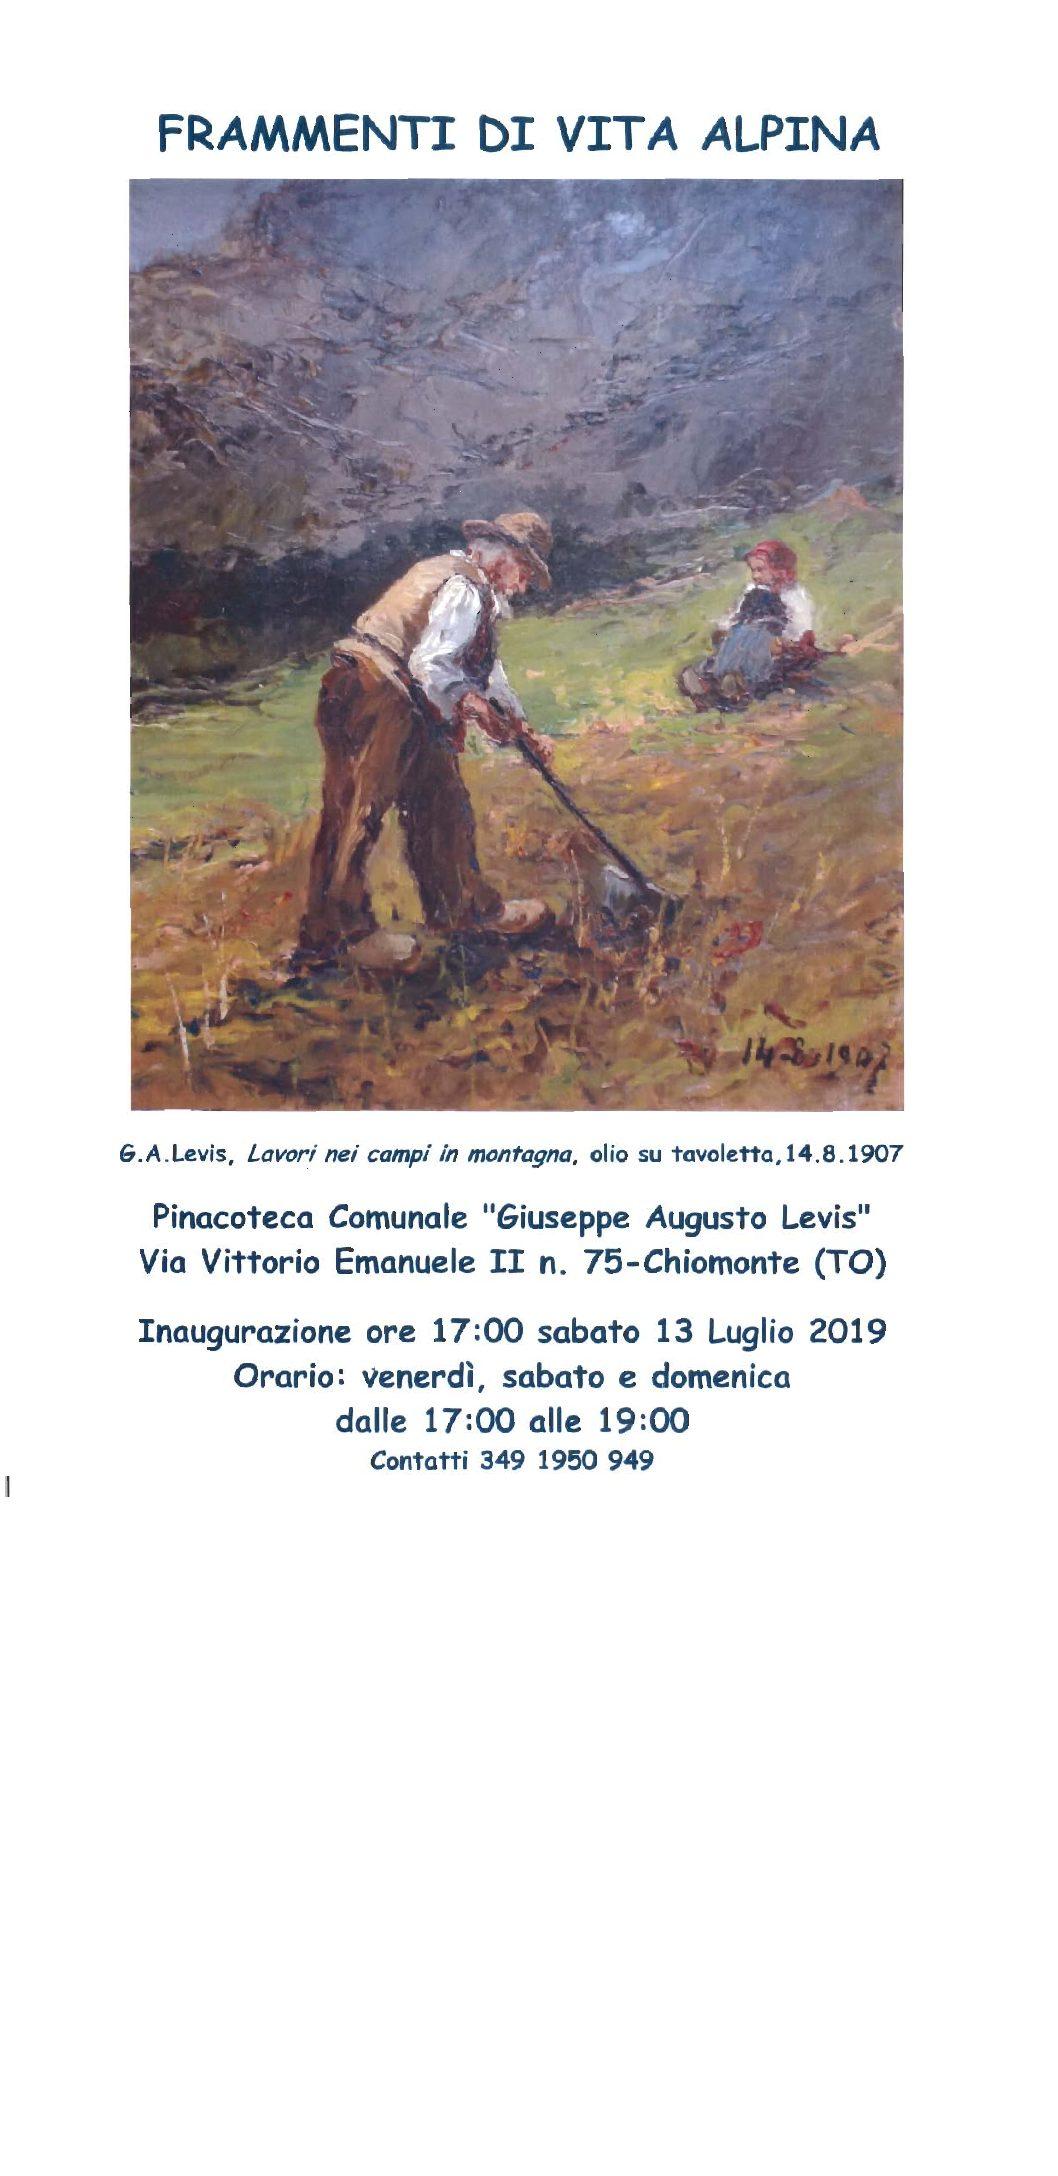 Mostra temporanea presso la pinacoteca Levis